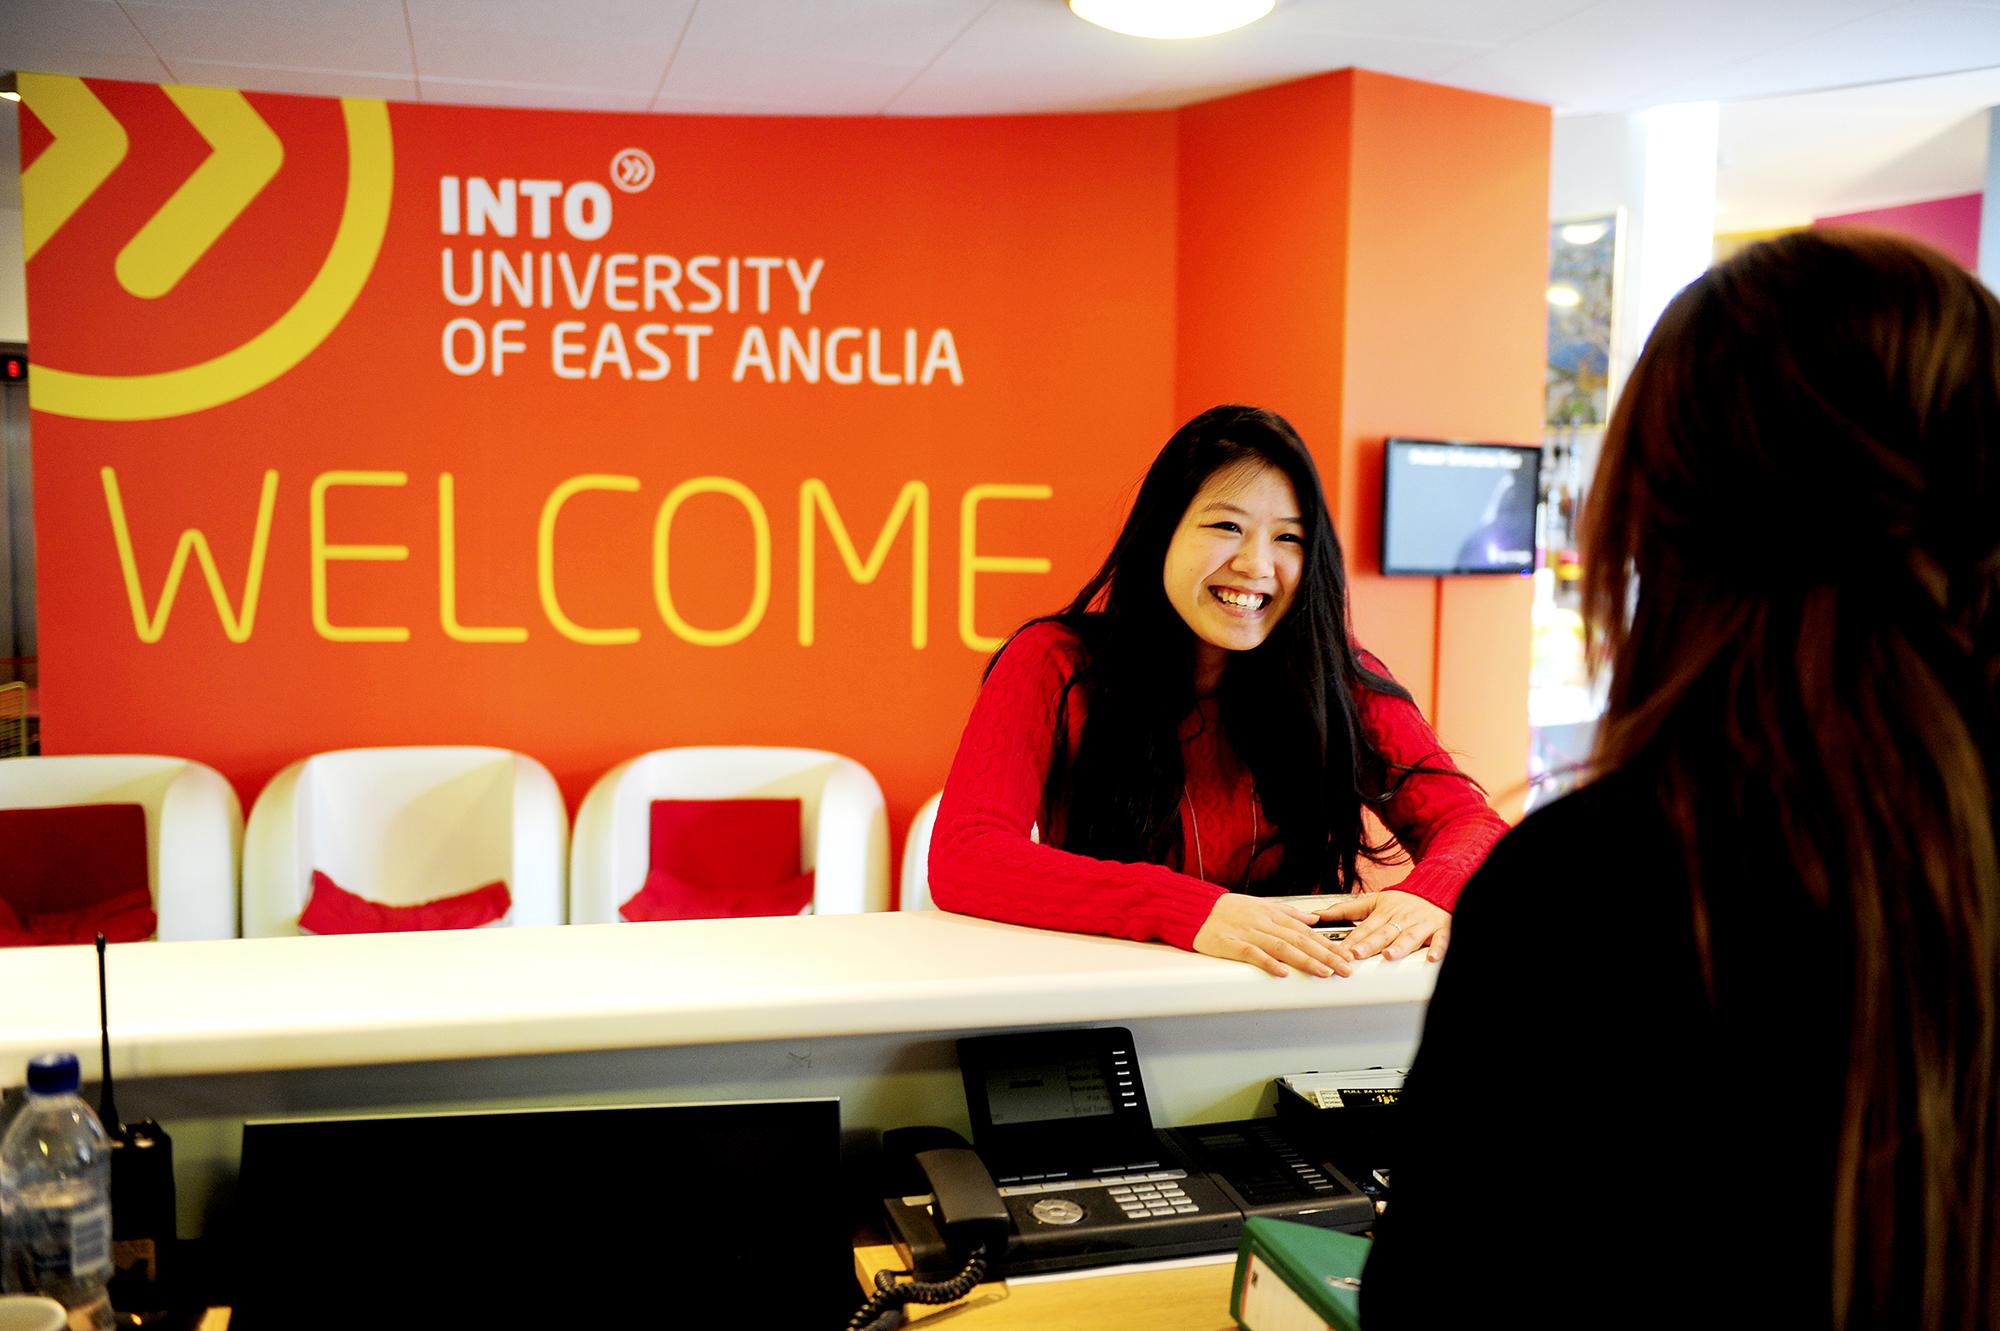 INTO UEA Welcome Desk